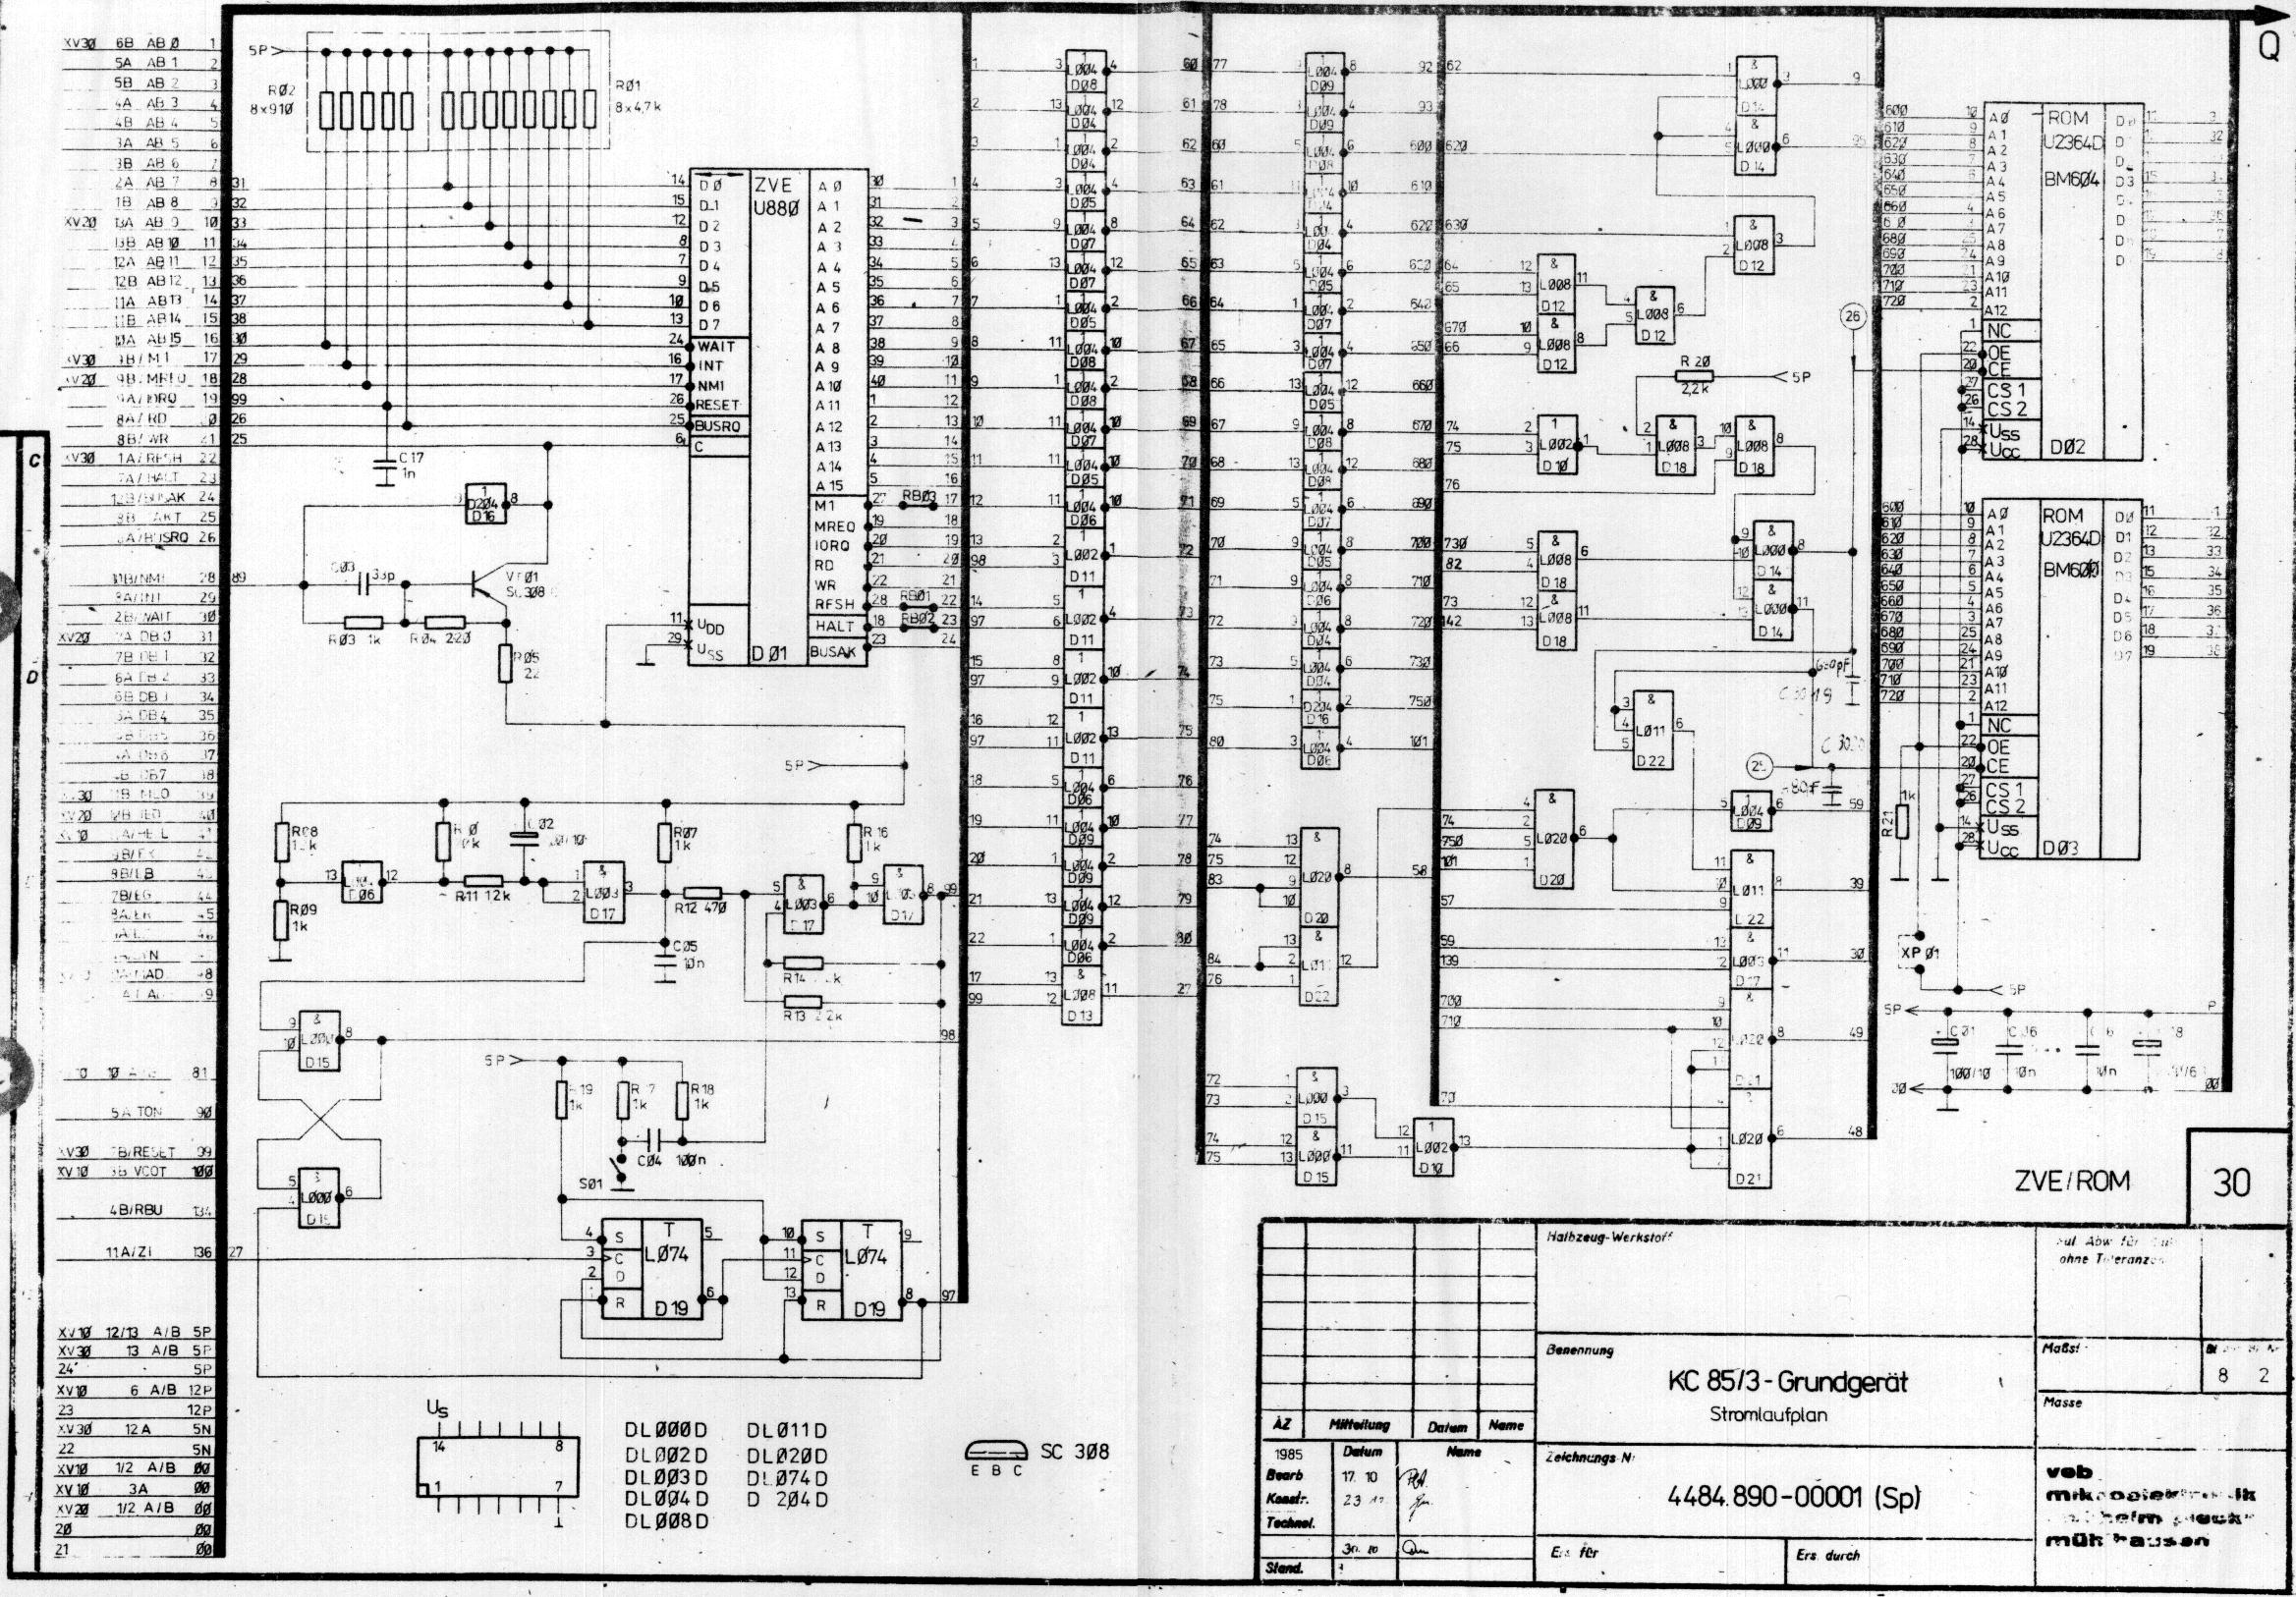 Stromlaufplan - Neon - 2nd Gen. ( 00 - 05 ) - Neonowners.de - Das ...